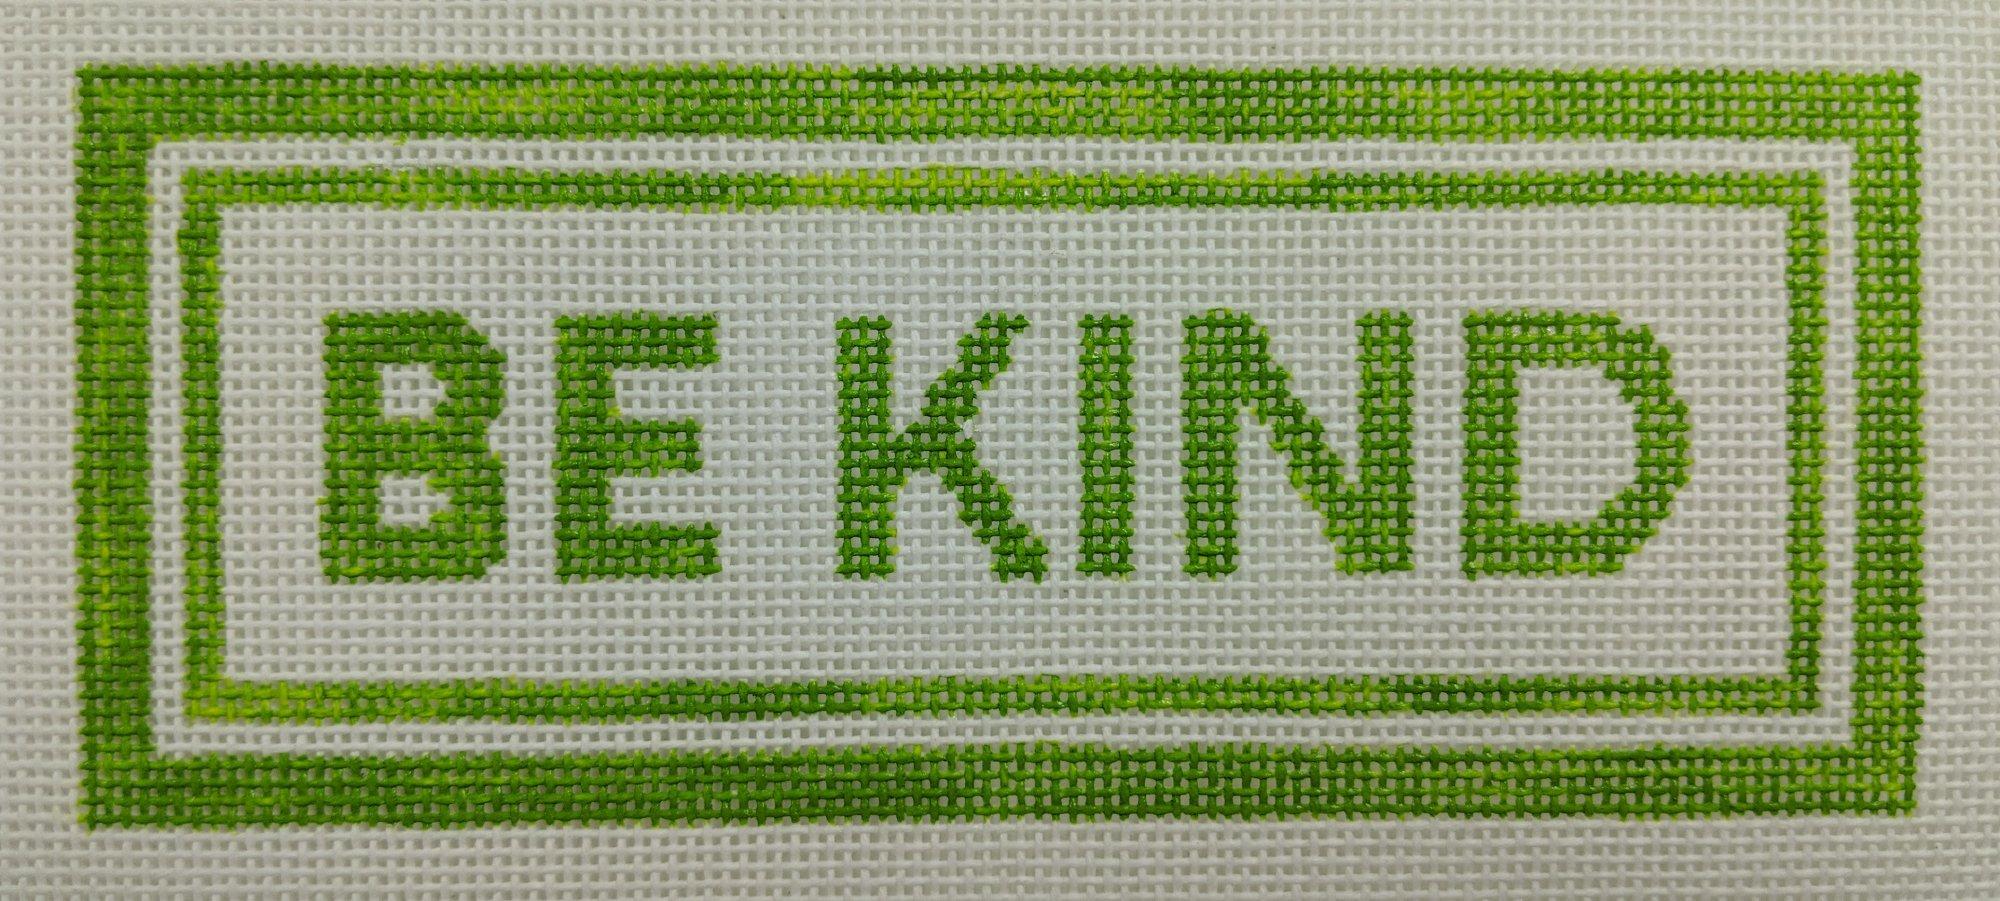 Be Kind (green), 18 mesh, 6 x 2.5